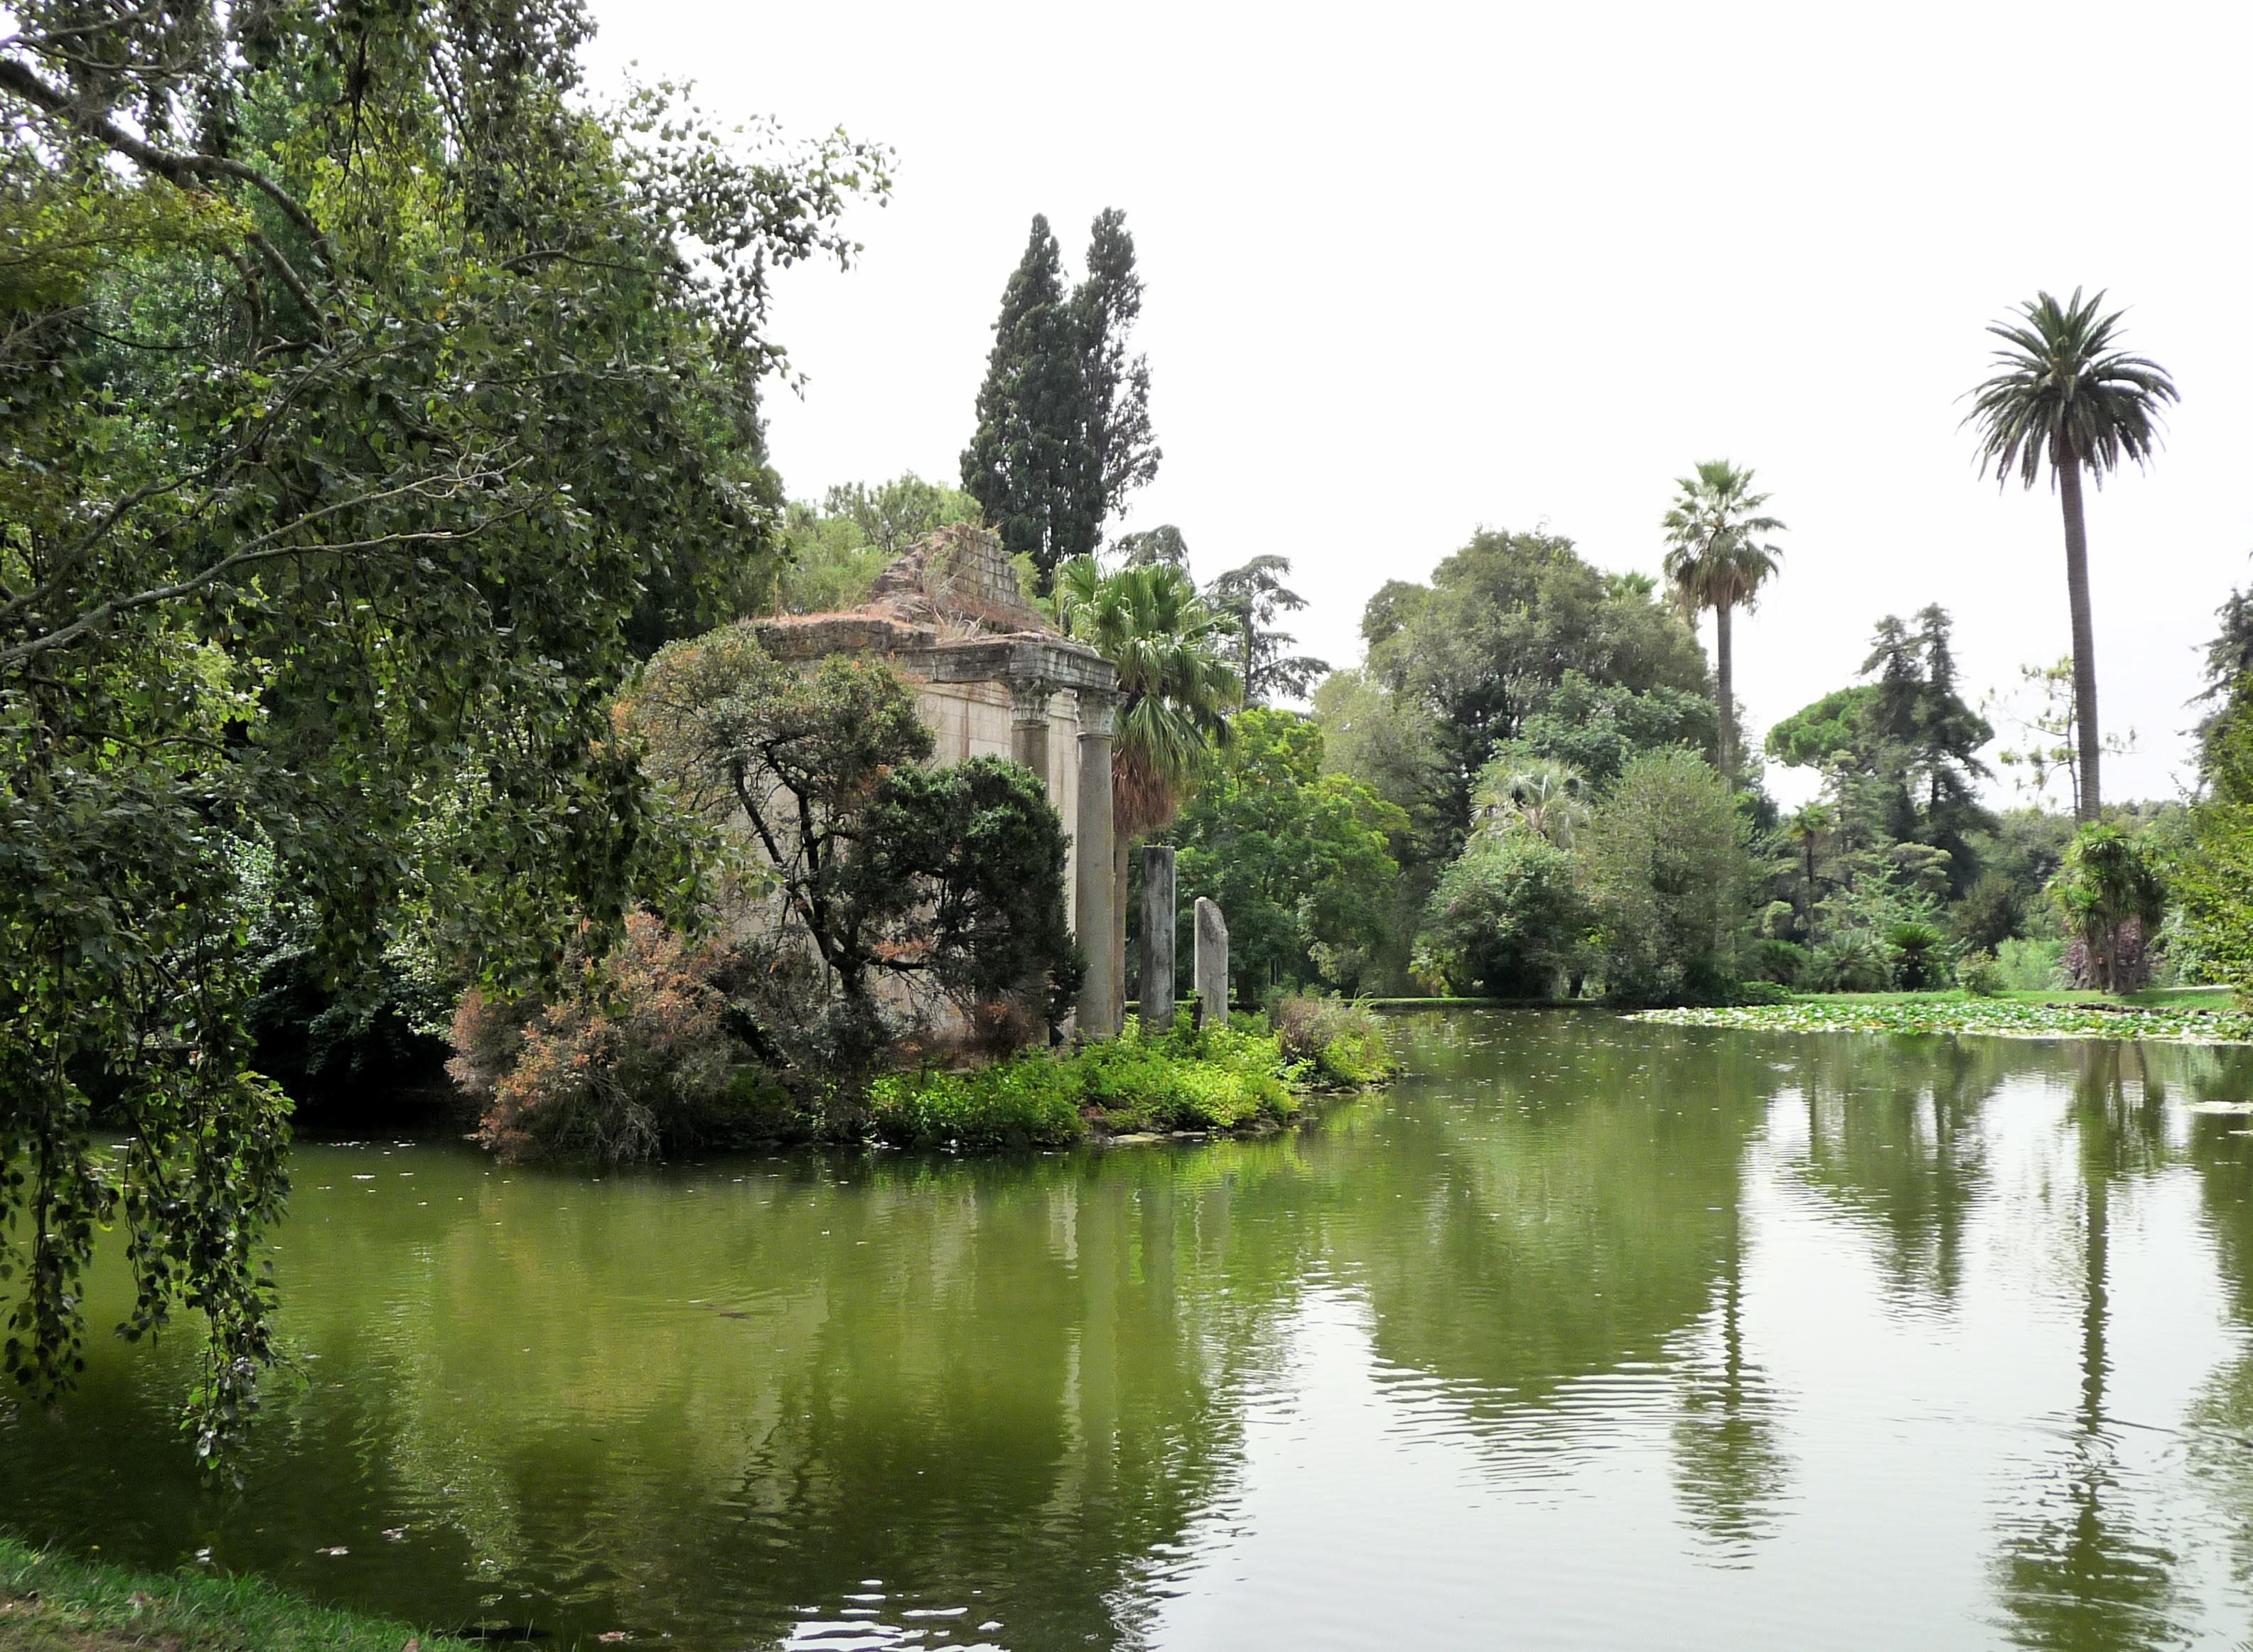 File giardino inglese reggia caserta false rovine laghetto wikipedia - Giardini reggia di caserta ...